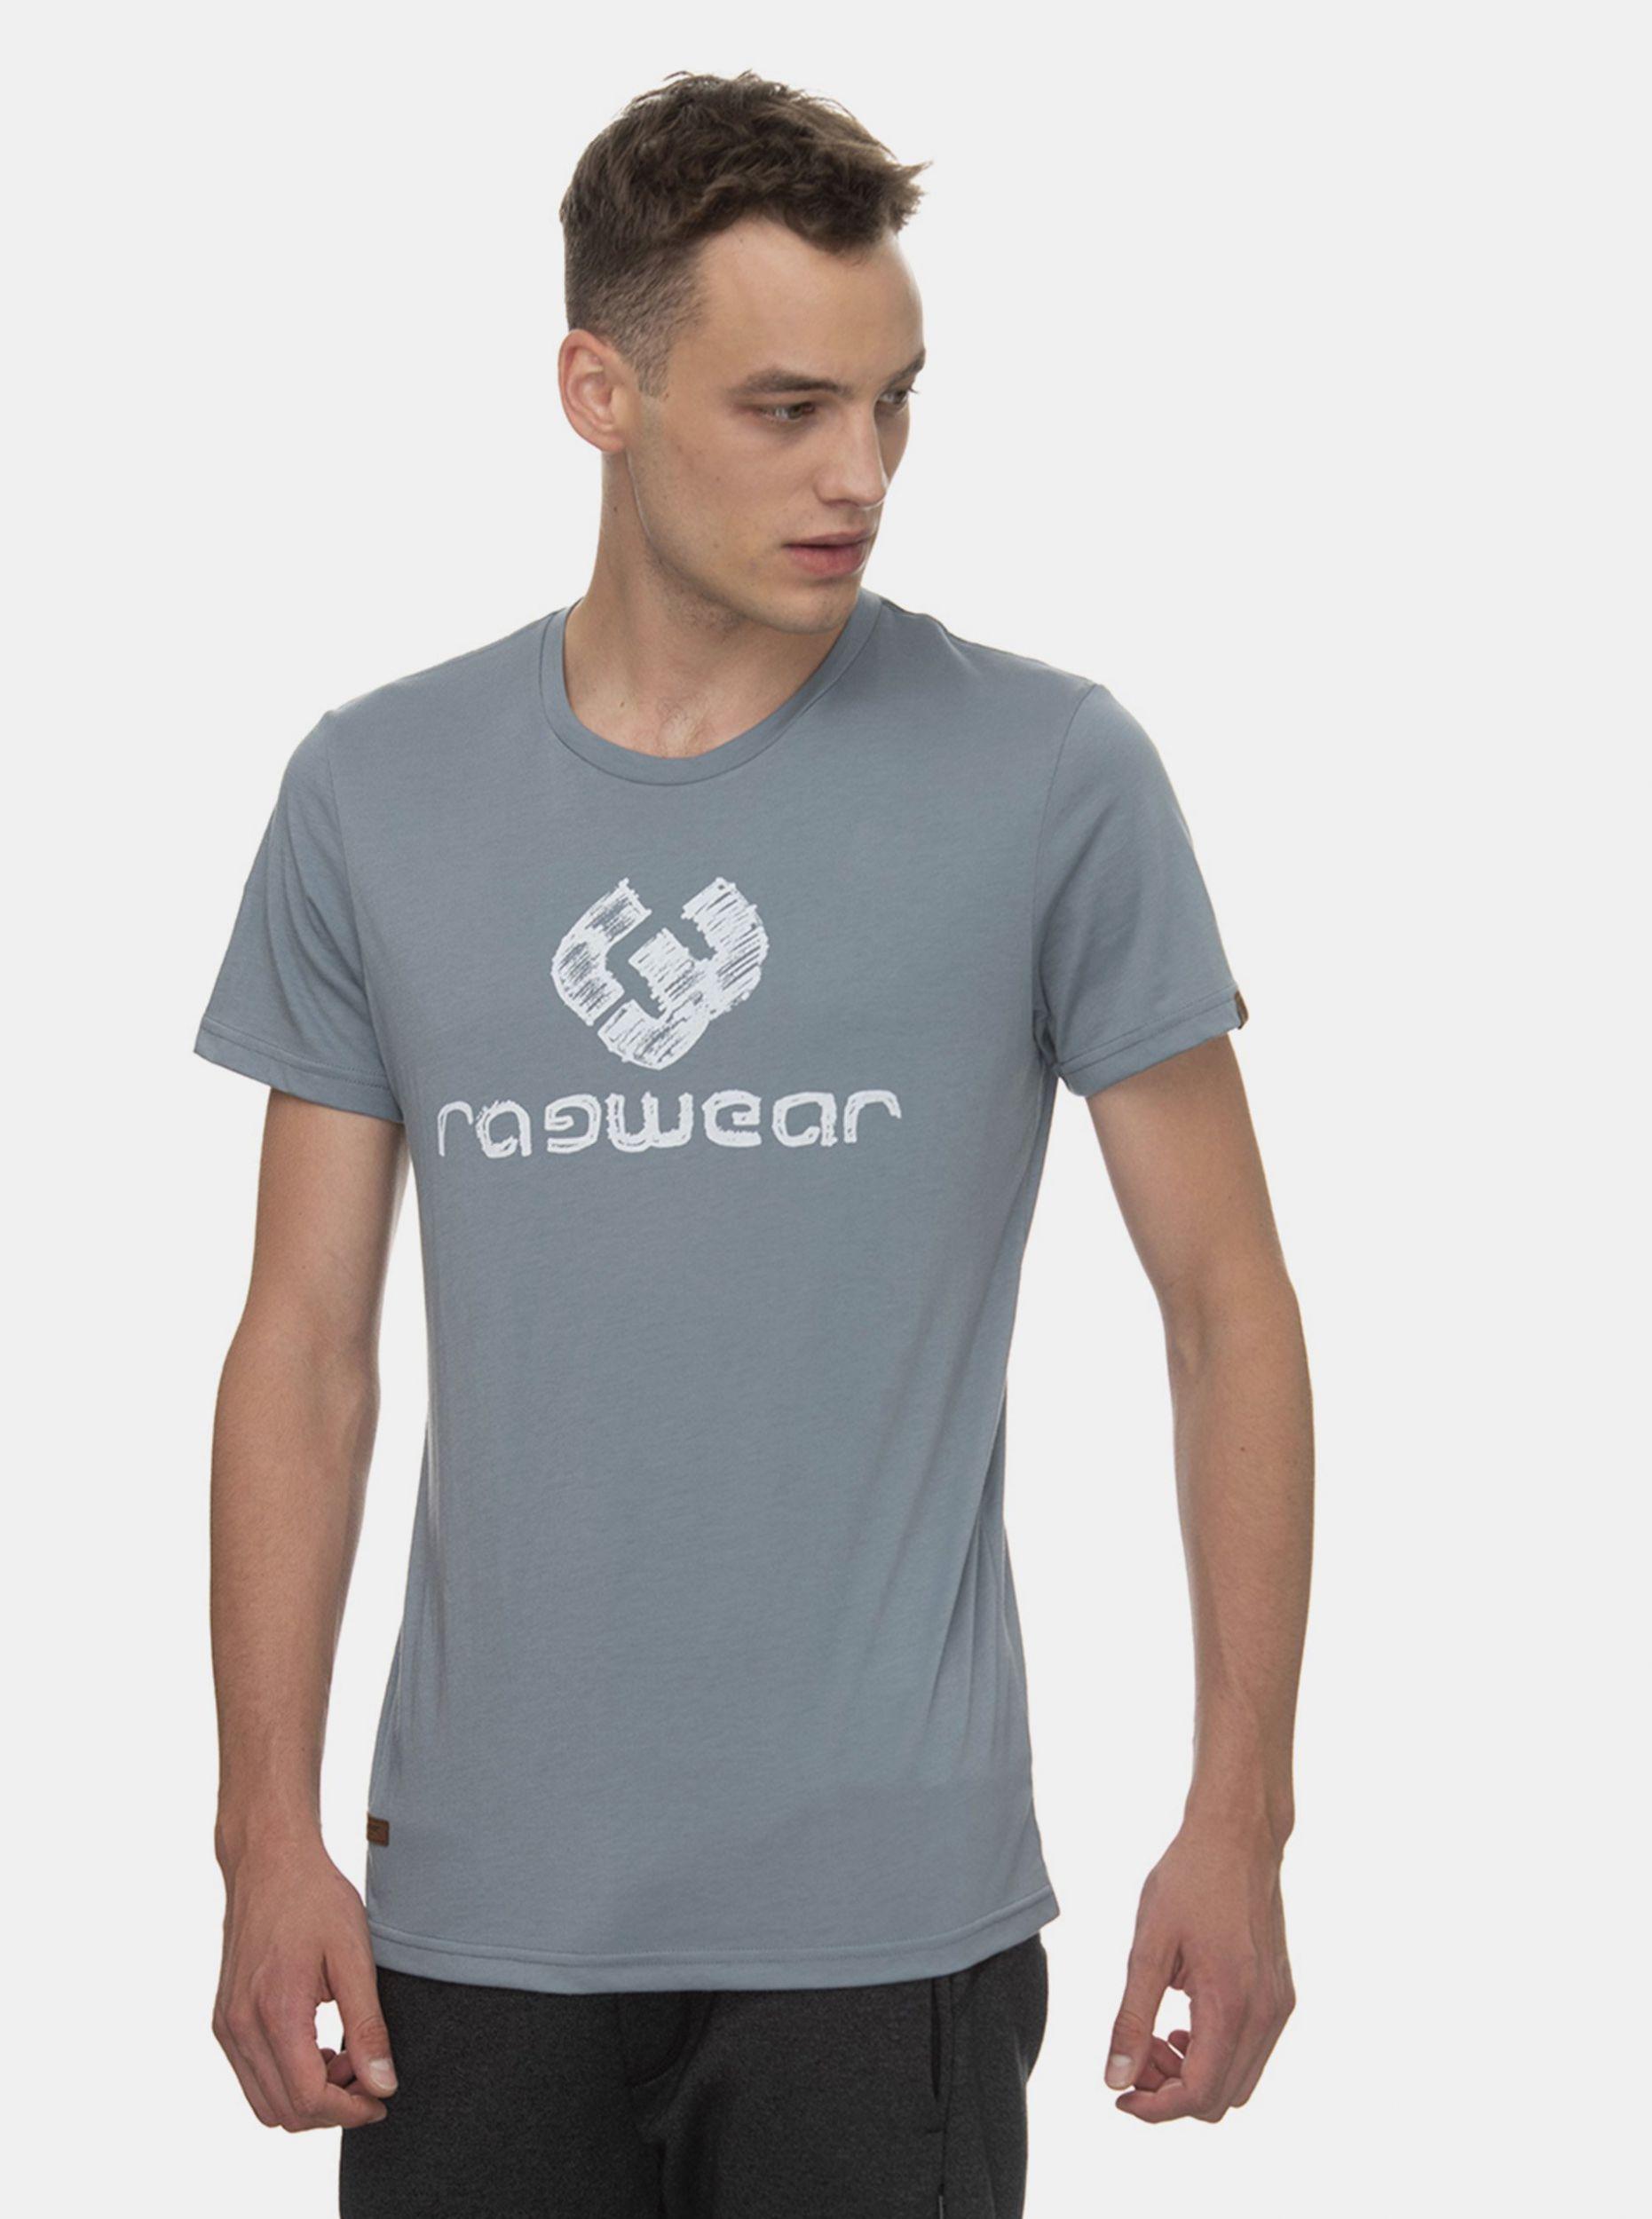 Ragwear šedé pánské tričko Charles s logem